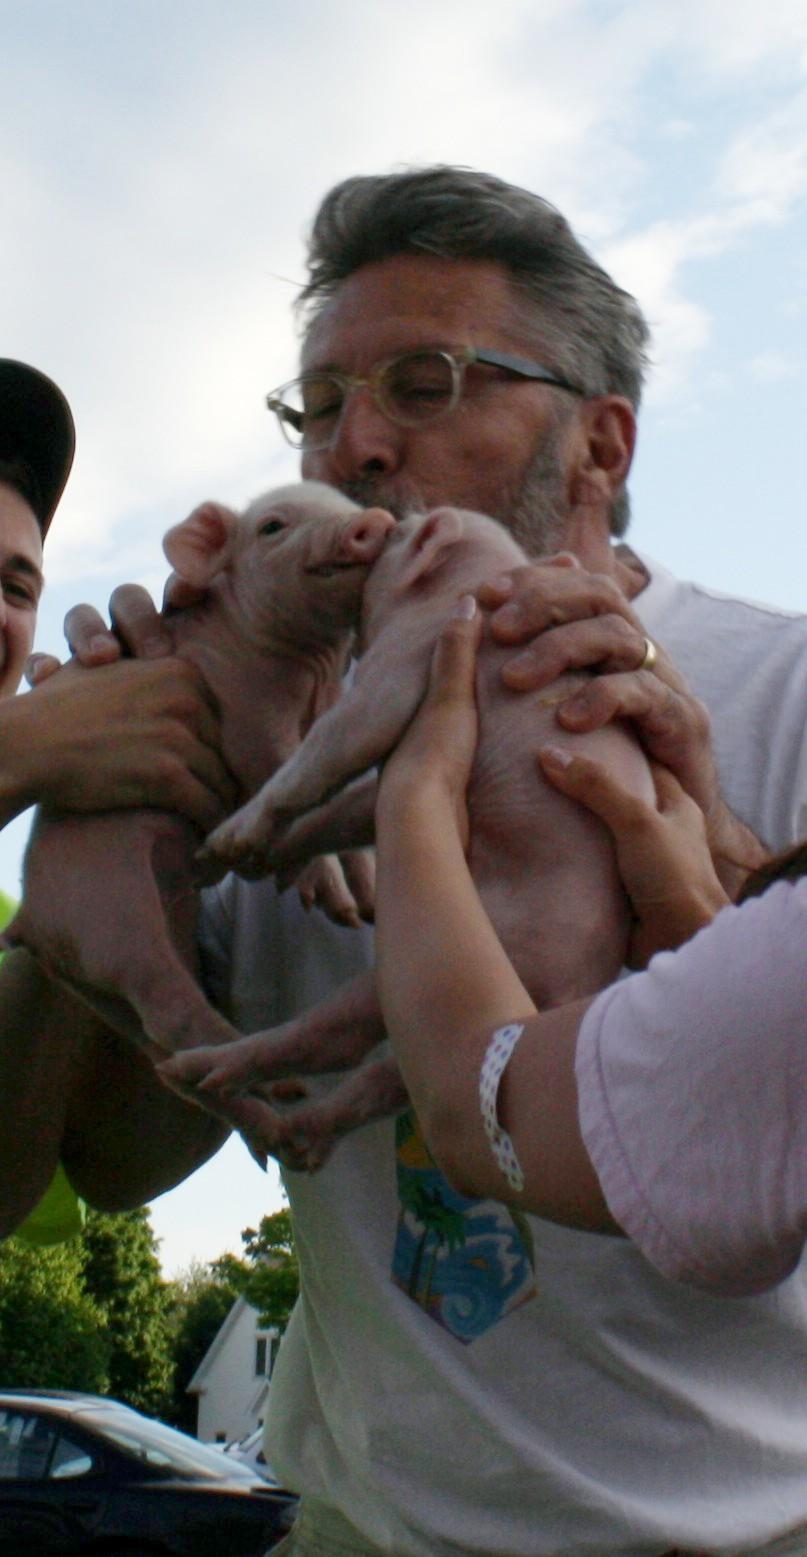 images.raceentry.com/infopages/relay-for-life-pucker-up-pig-run-infopages-1670.jpg